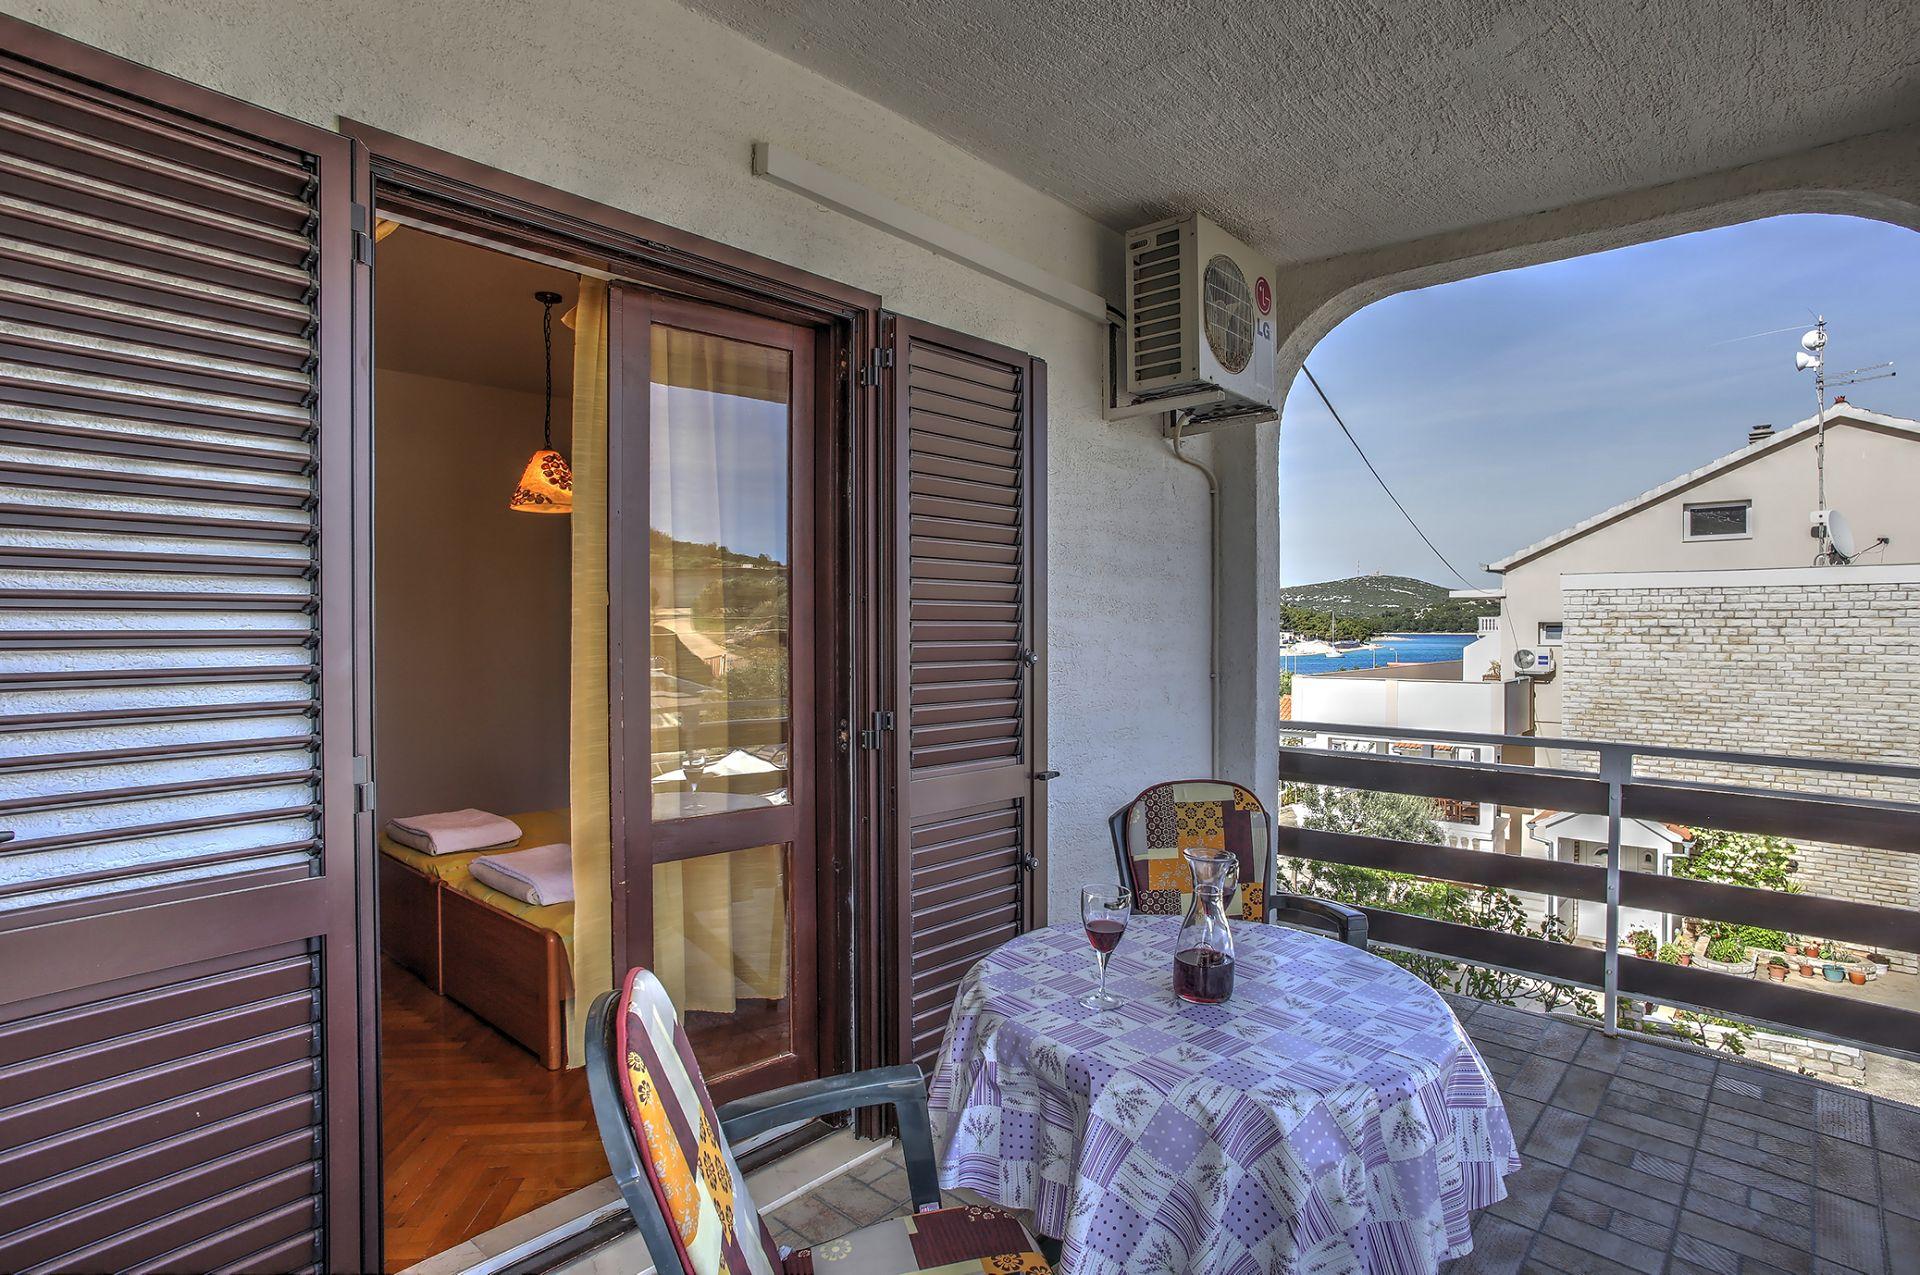 5409 - Jezera - Apartments Croatia - SA3(2): terrace